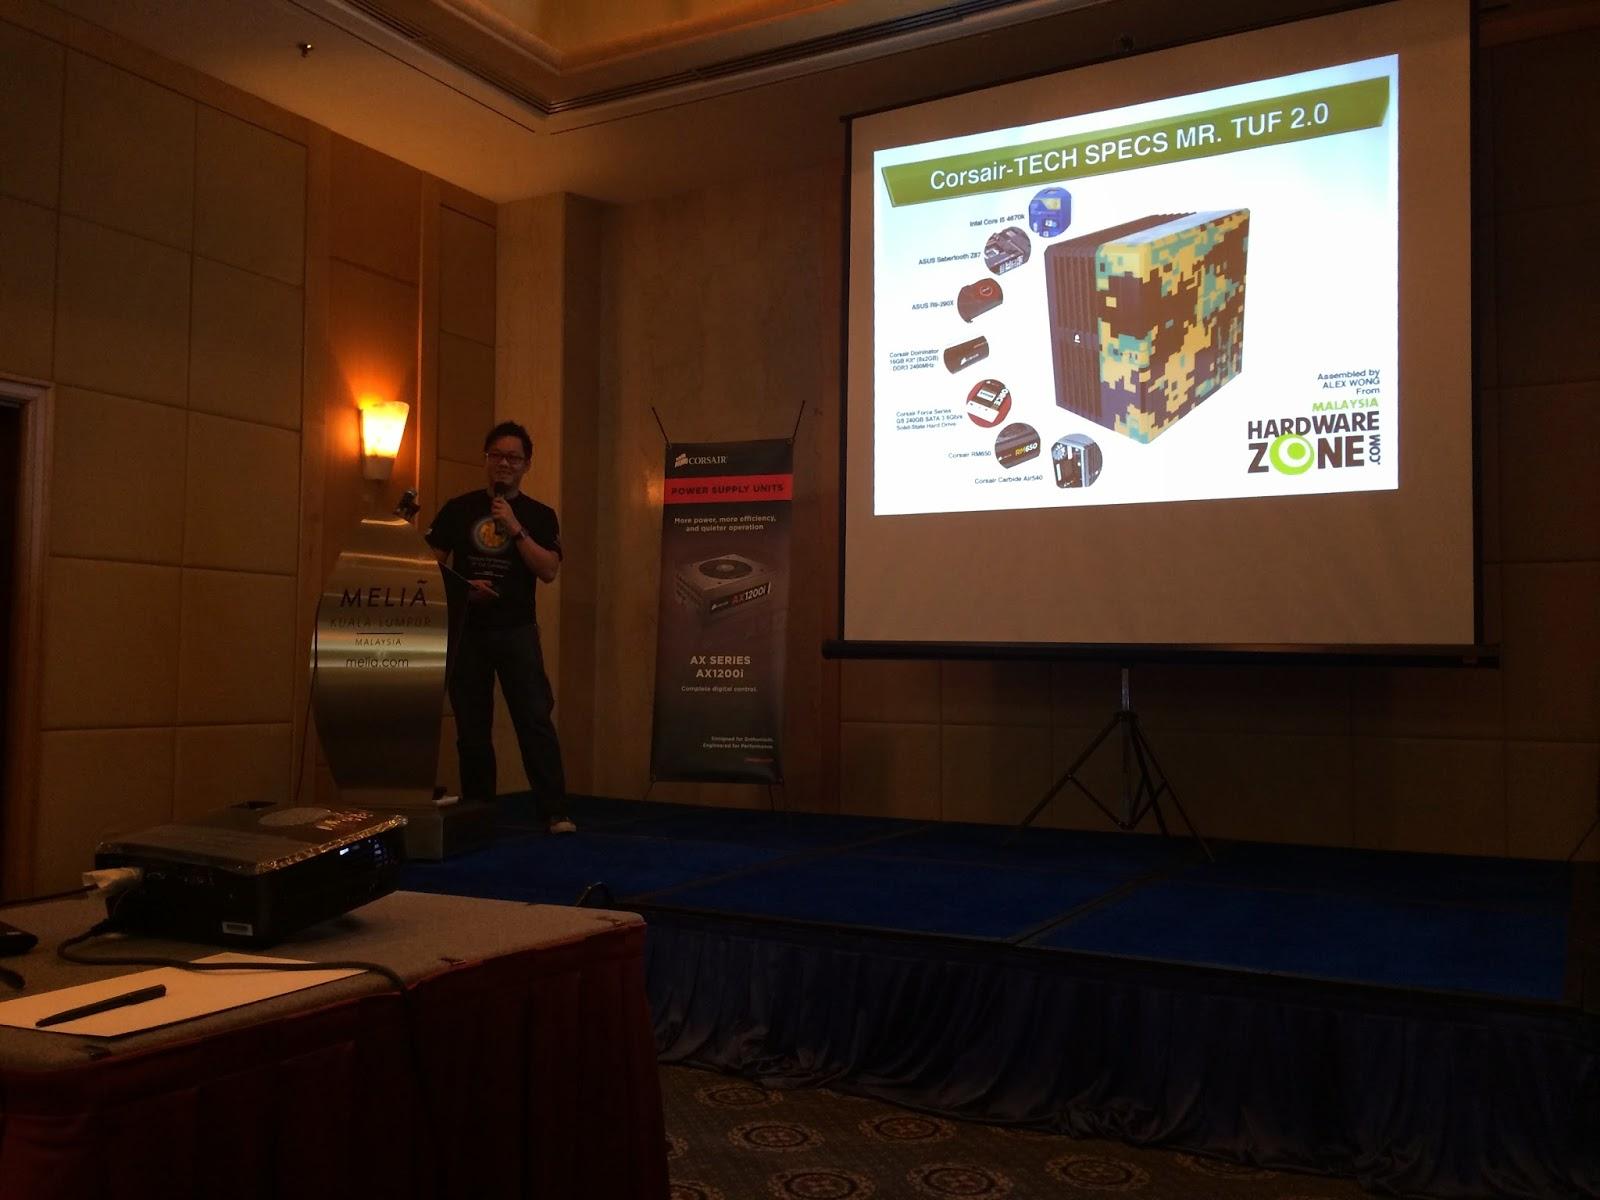 Coverage of Corsair Event @Melia Kuala Lumpur 27